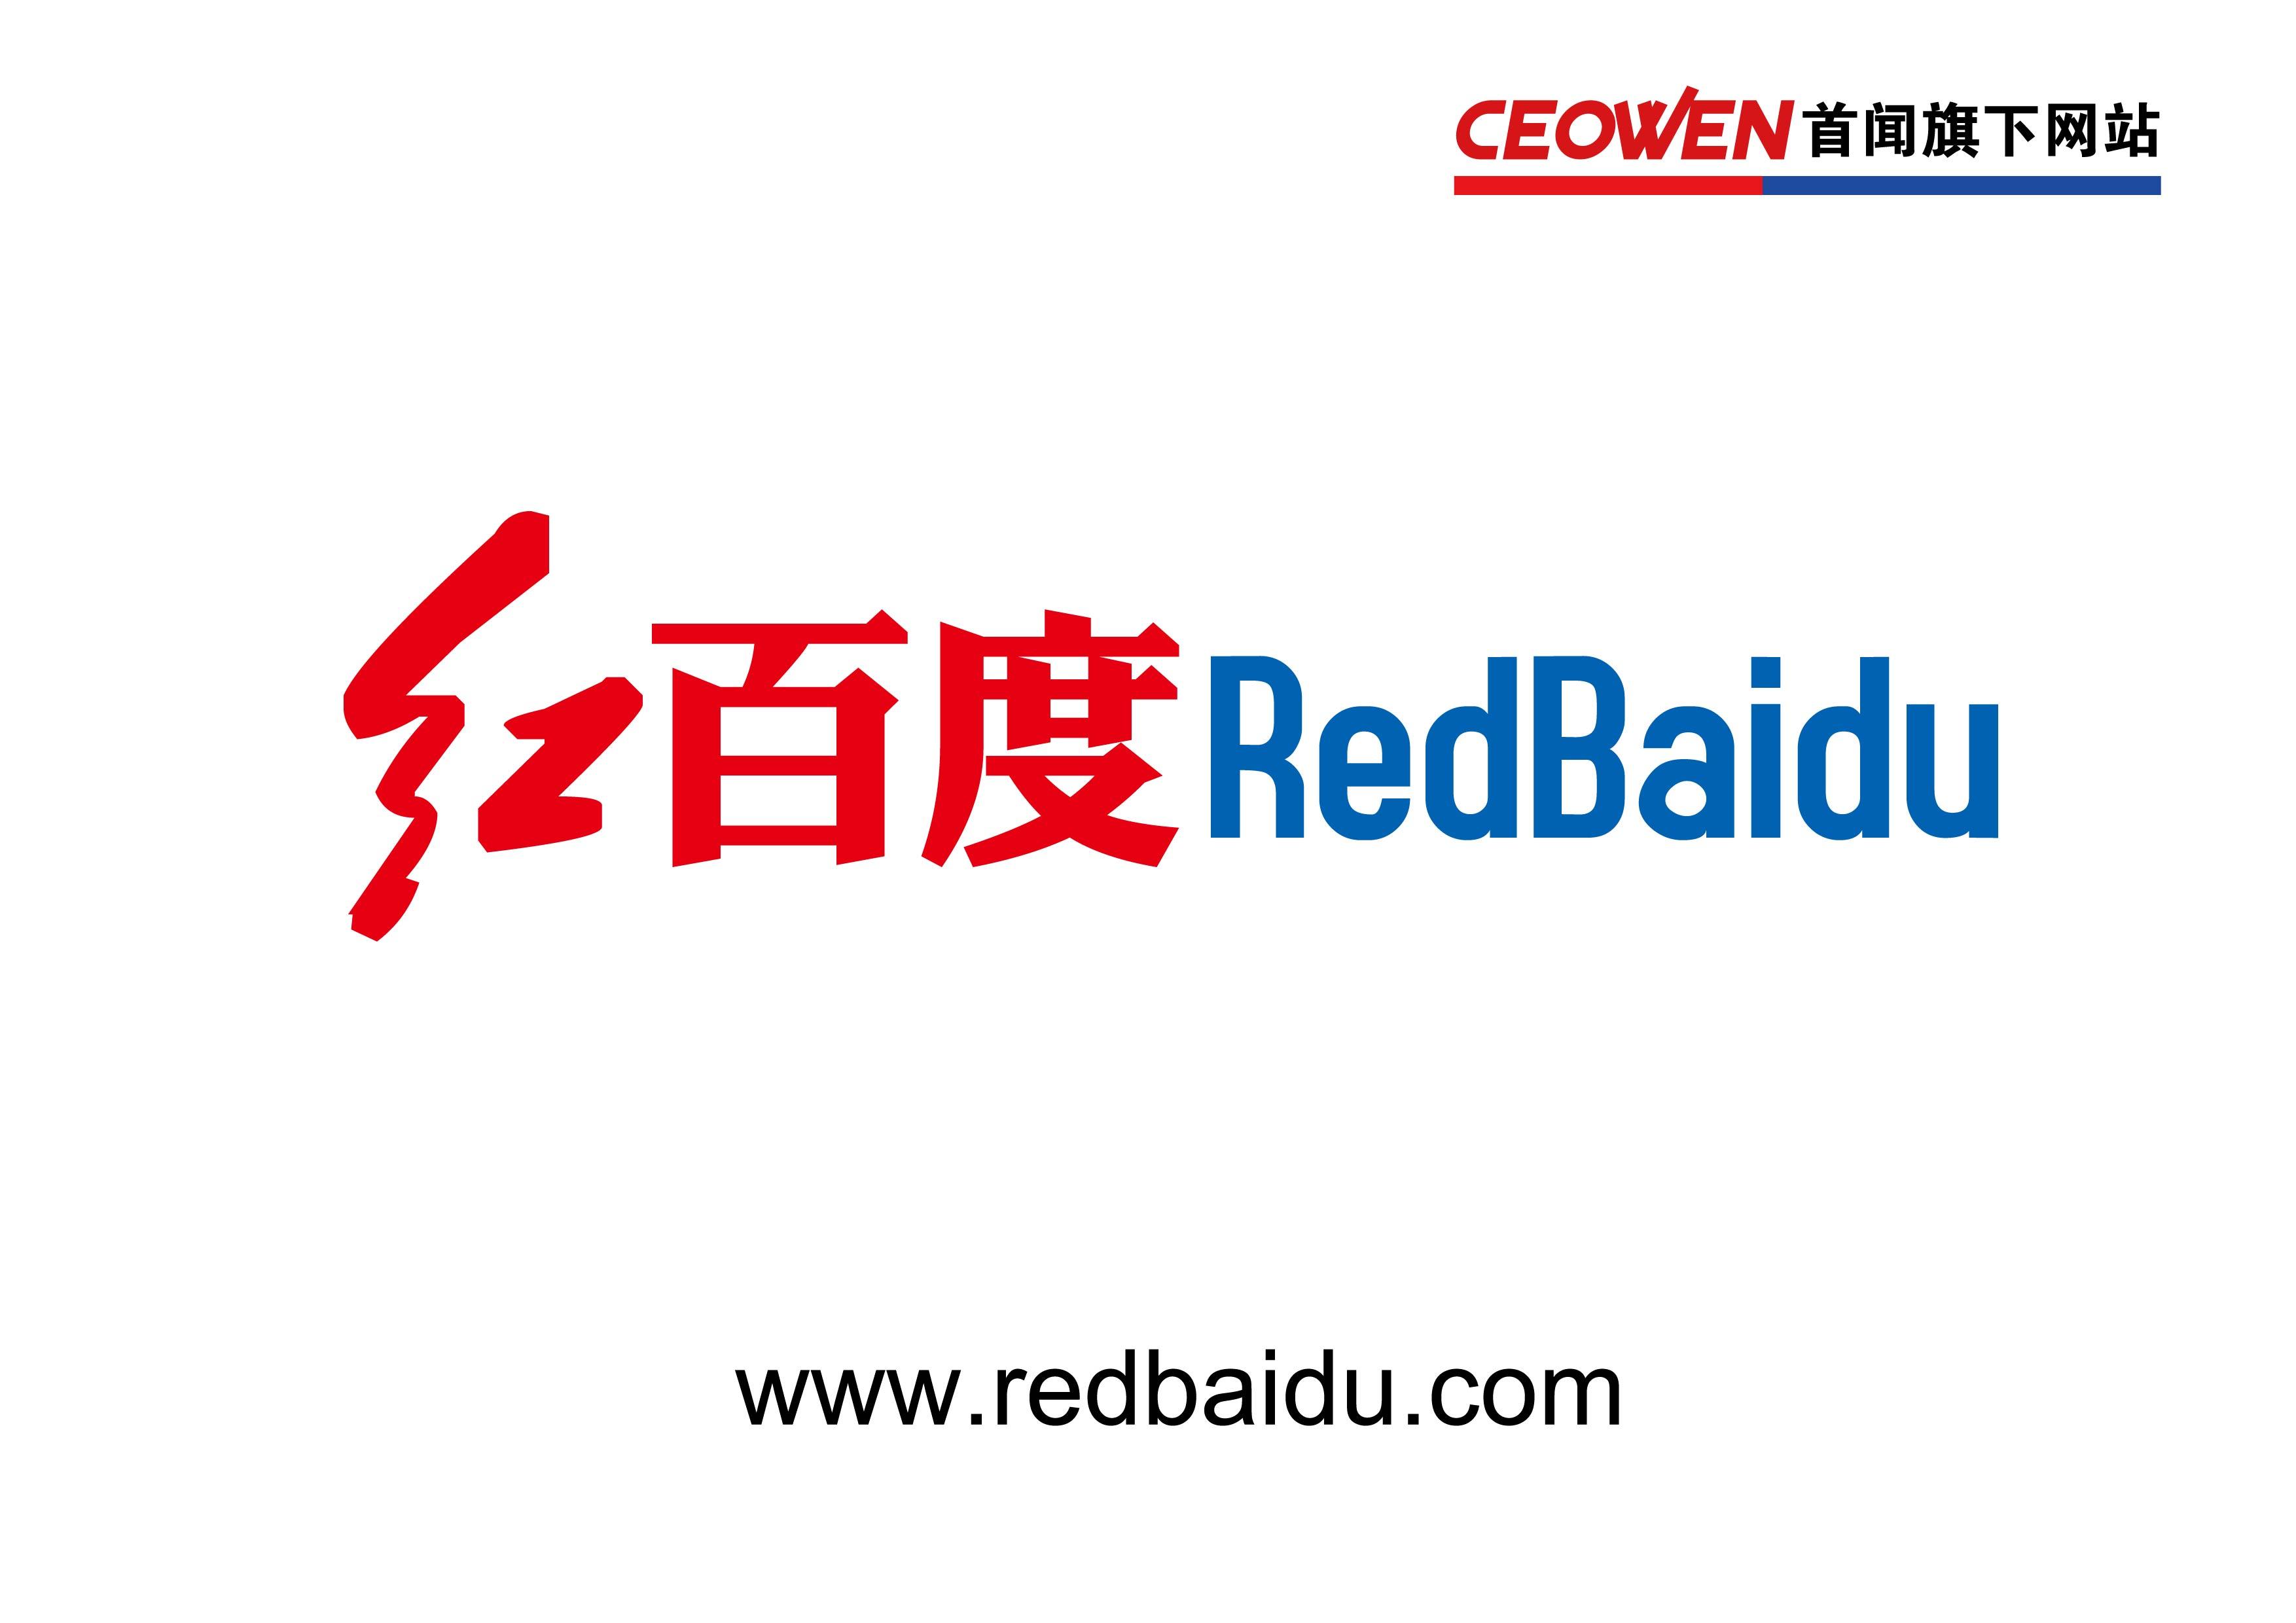 baidu/在深圳的朋友,深圳托福培训哪家机构比较好,当然是从各方面看拉